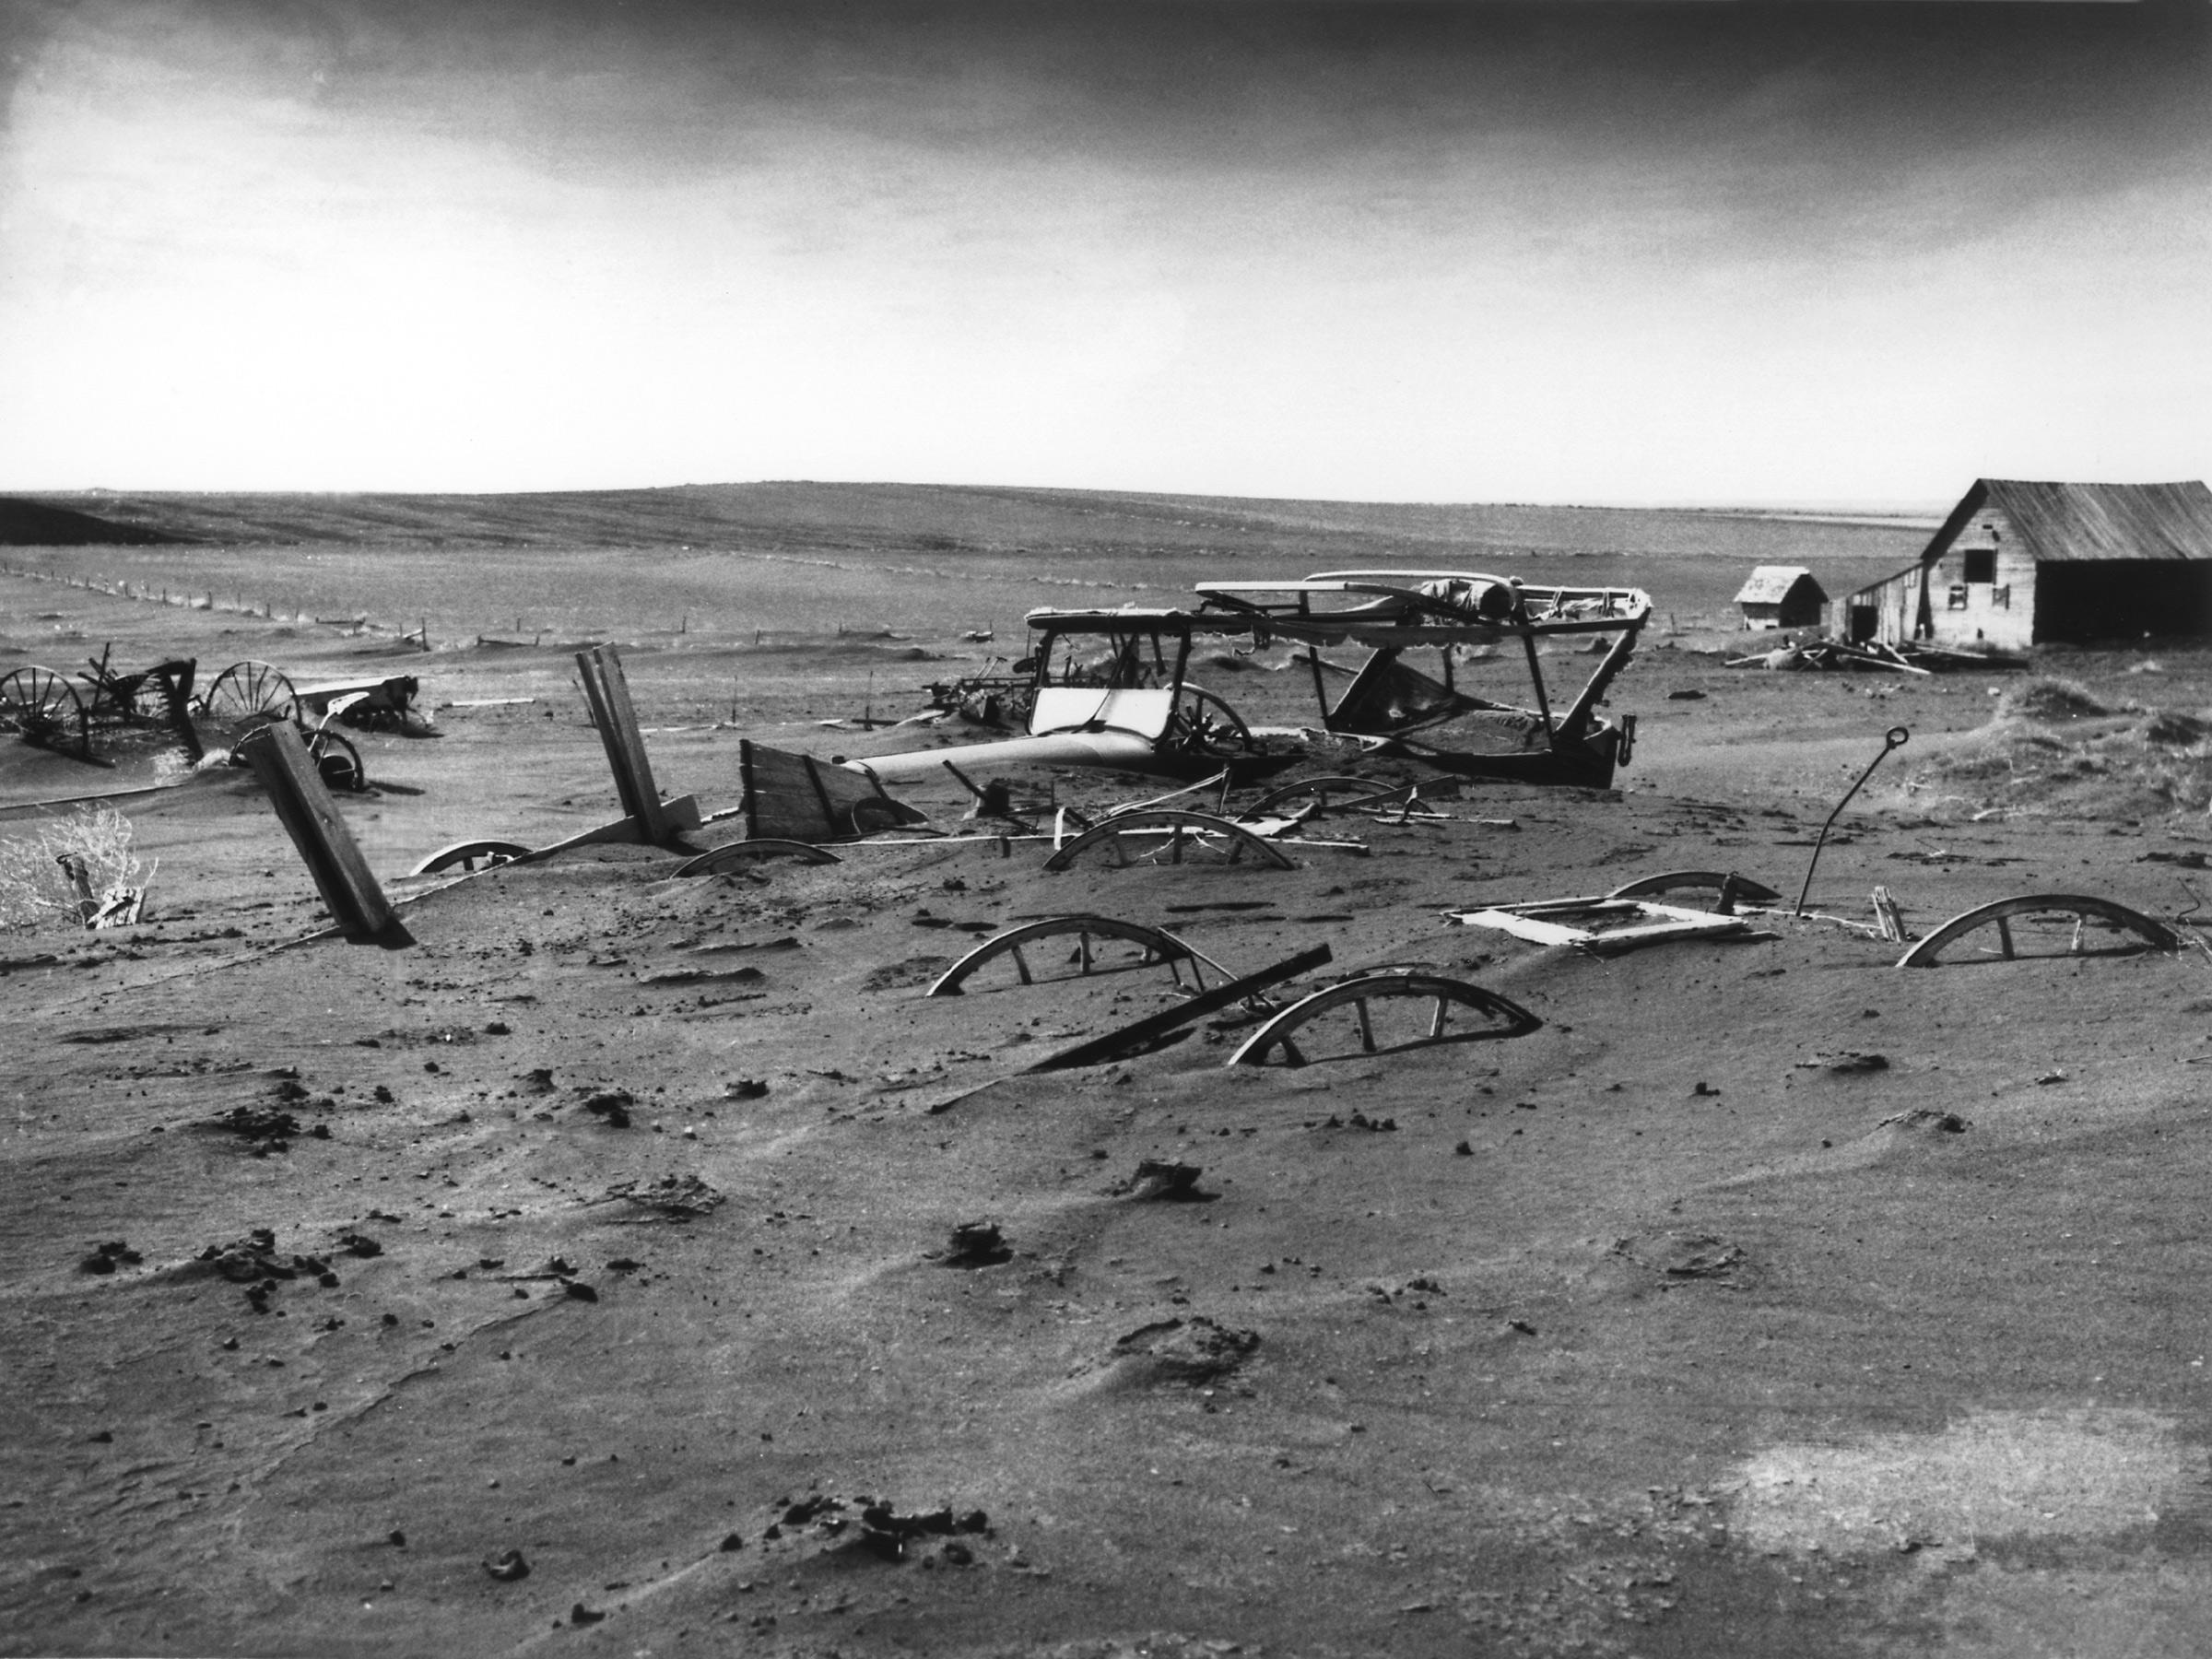 Farm equipment buried in dust Photo: wiki